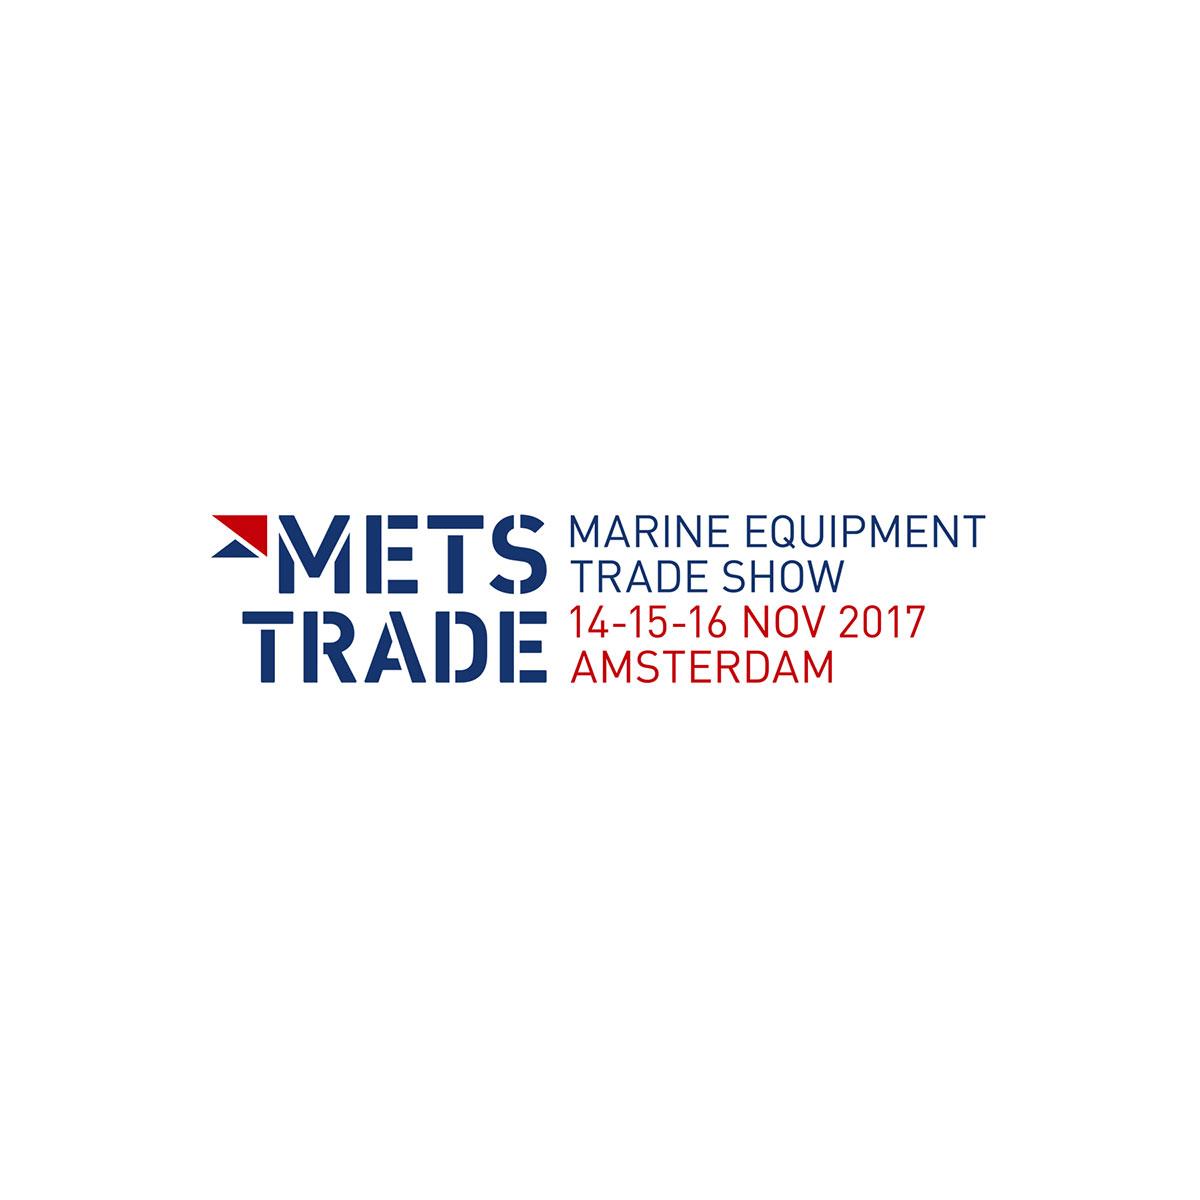 Mets Trade Amsterdam 2017